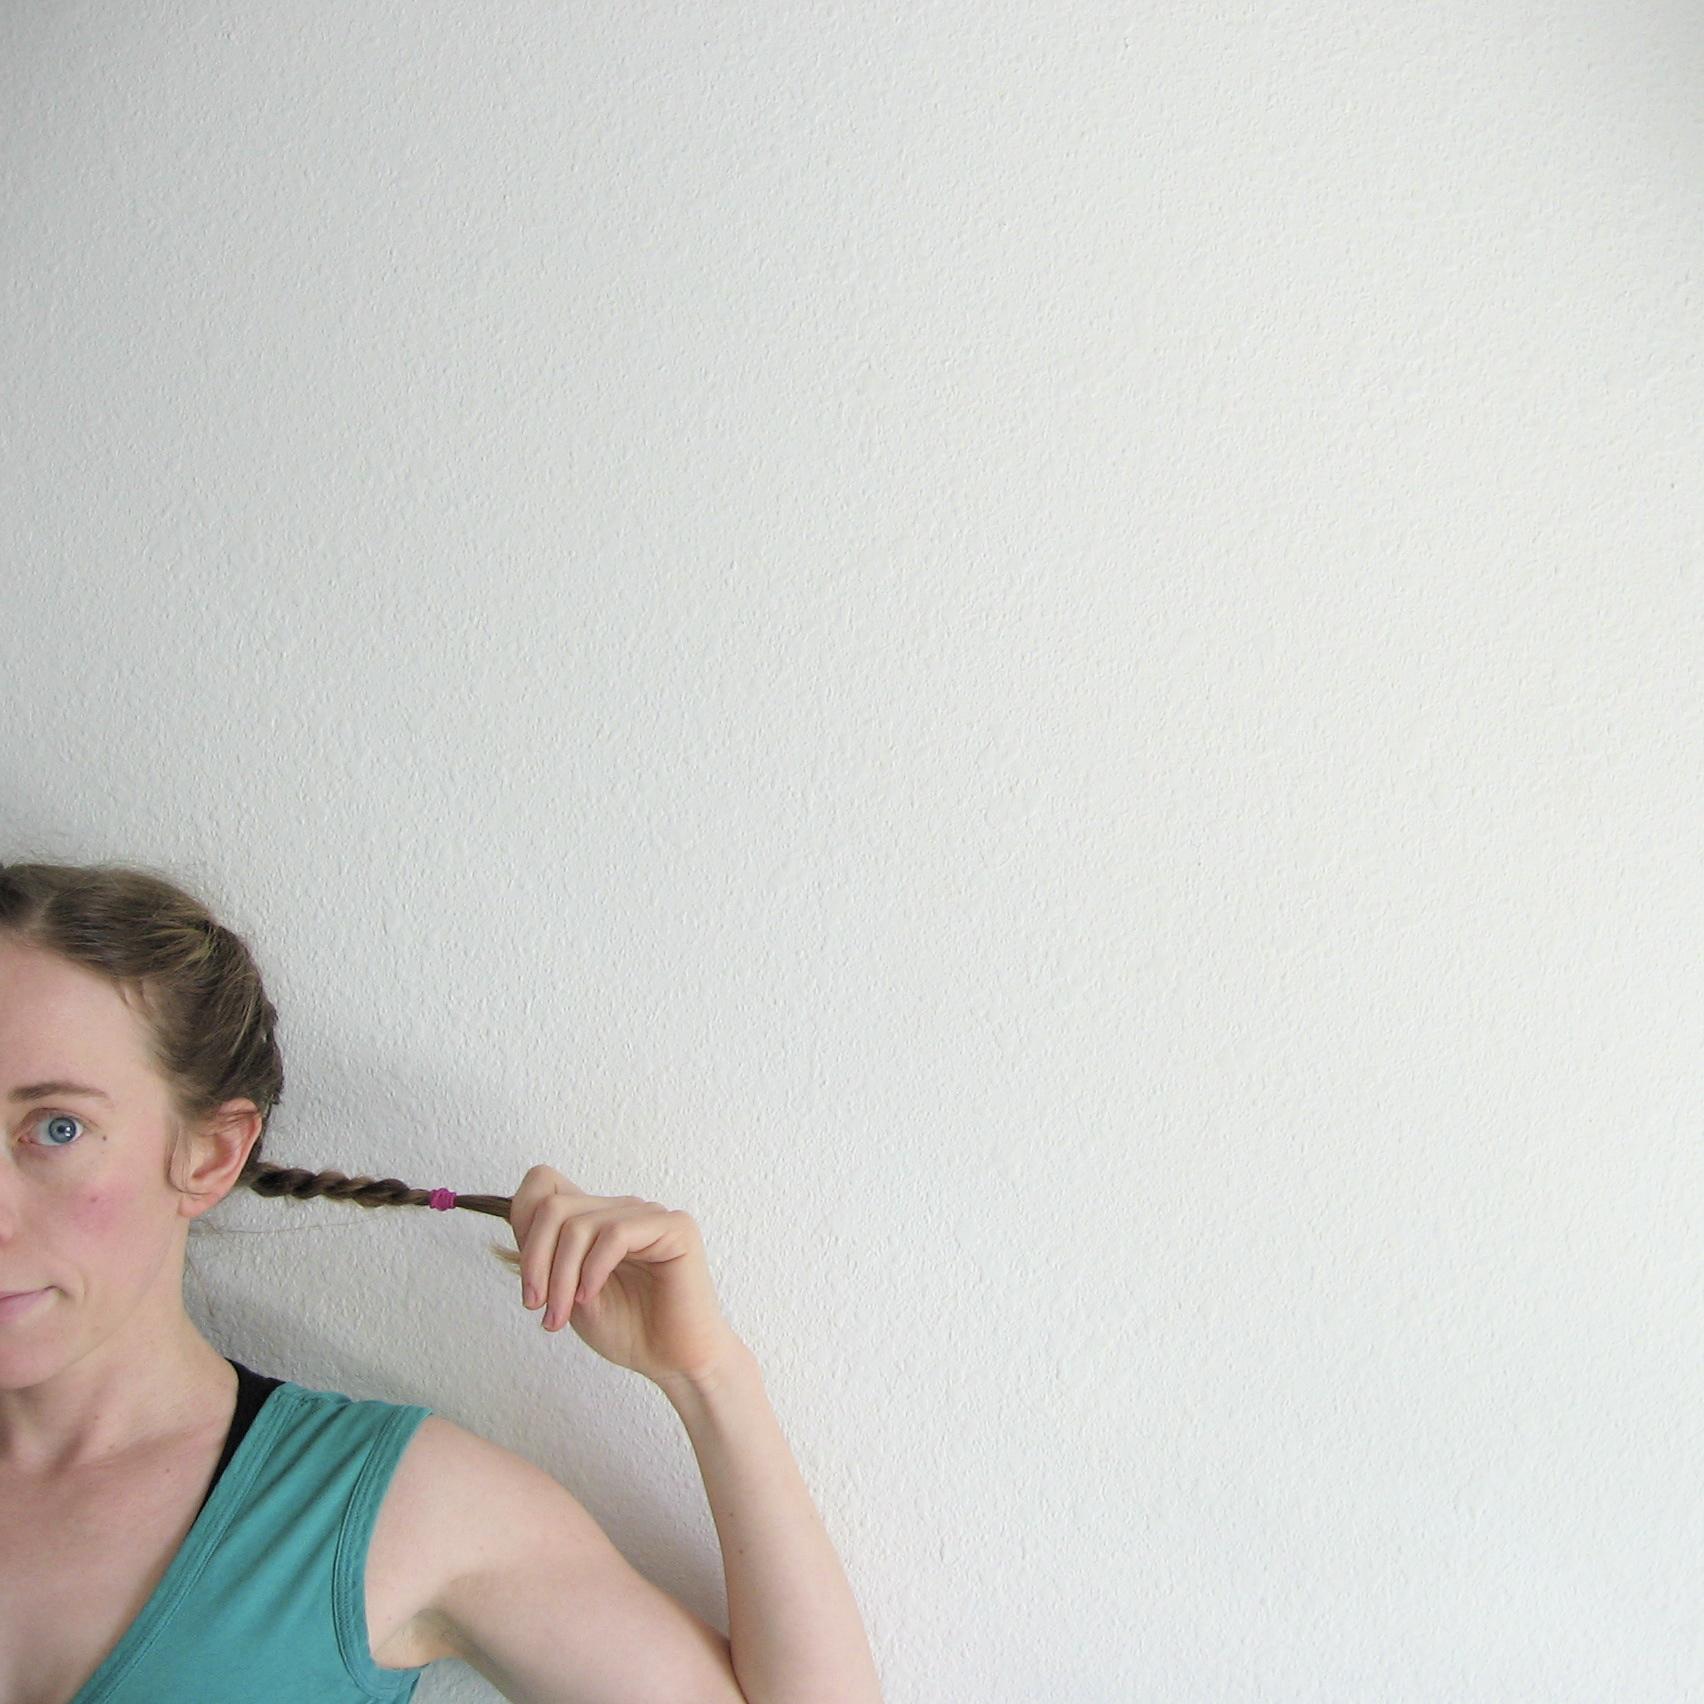 amanda ford selfies self portraits self love